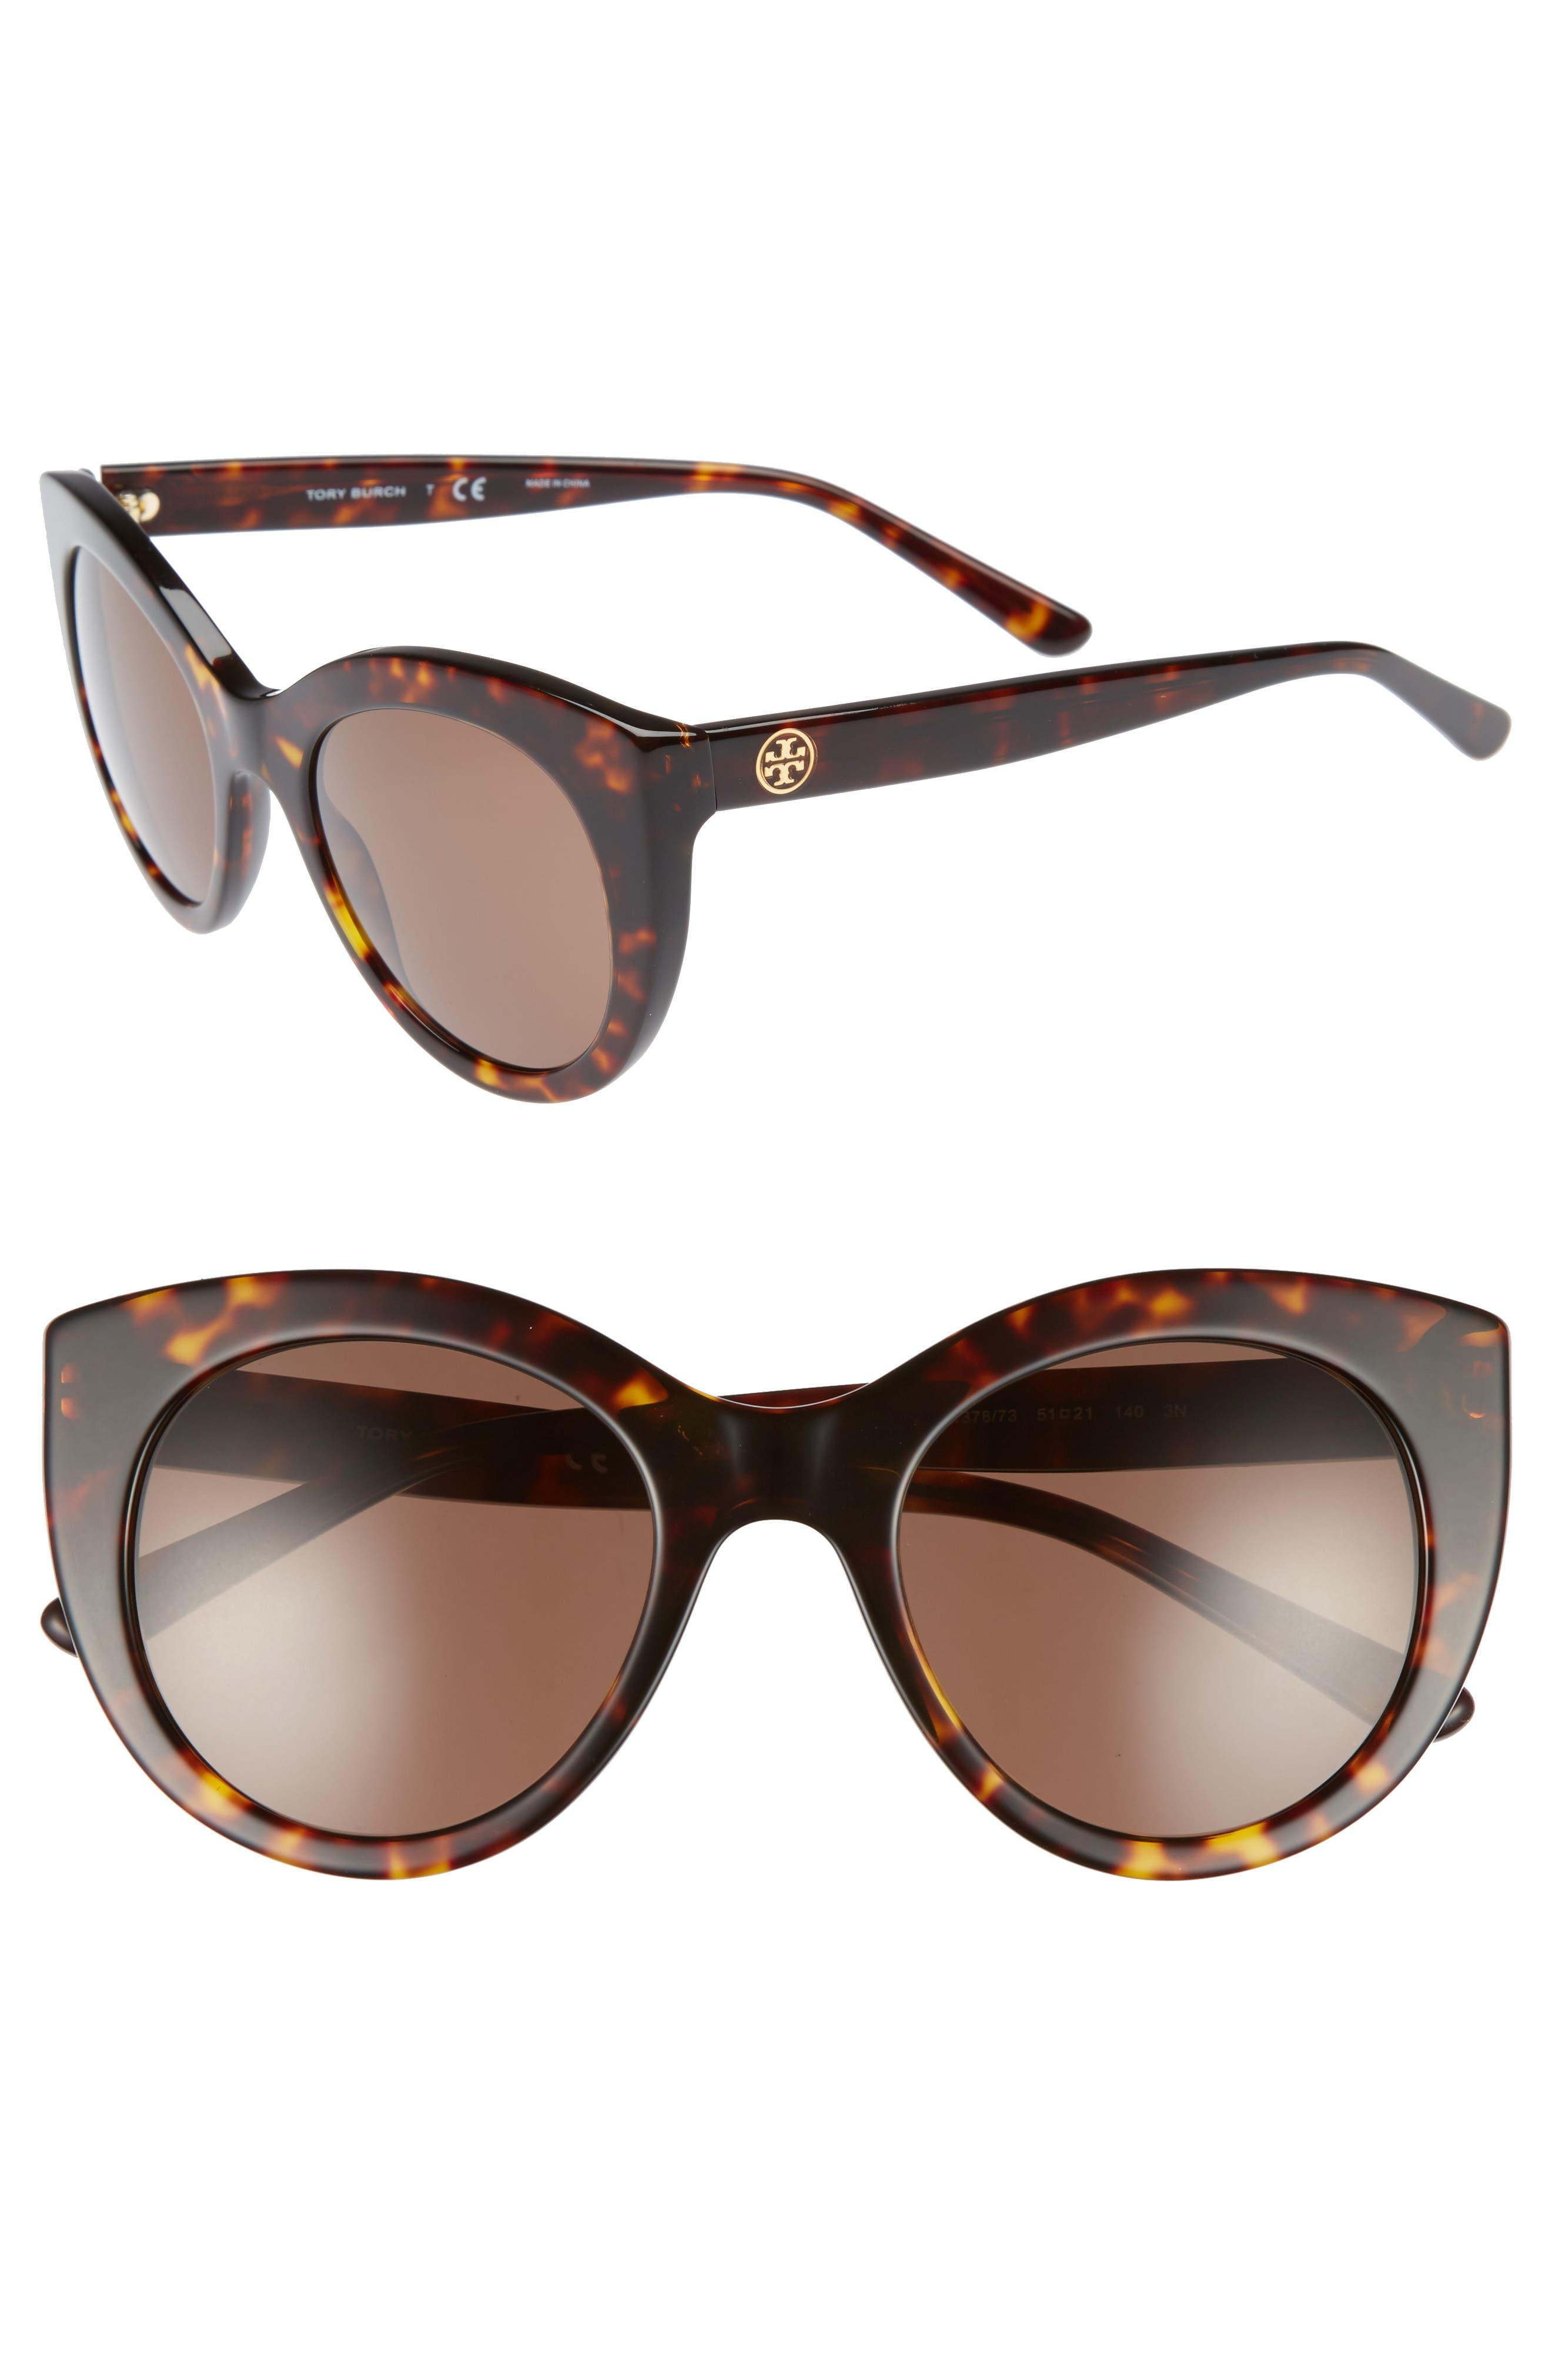 Main Image - Tory Burch 51mm Cat Eye Sunglasses